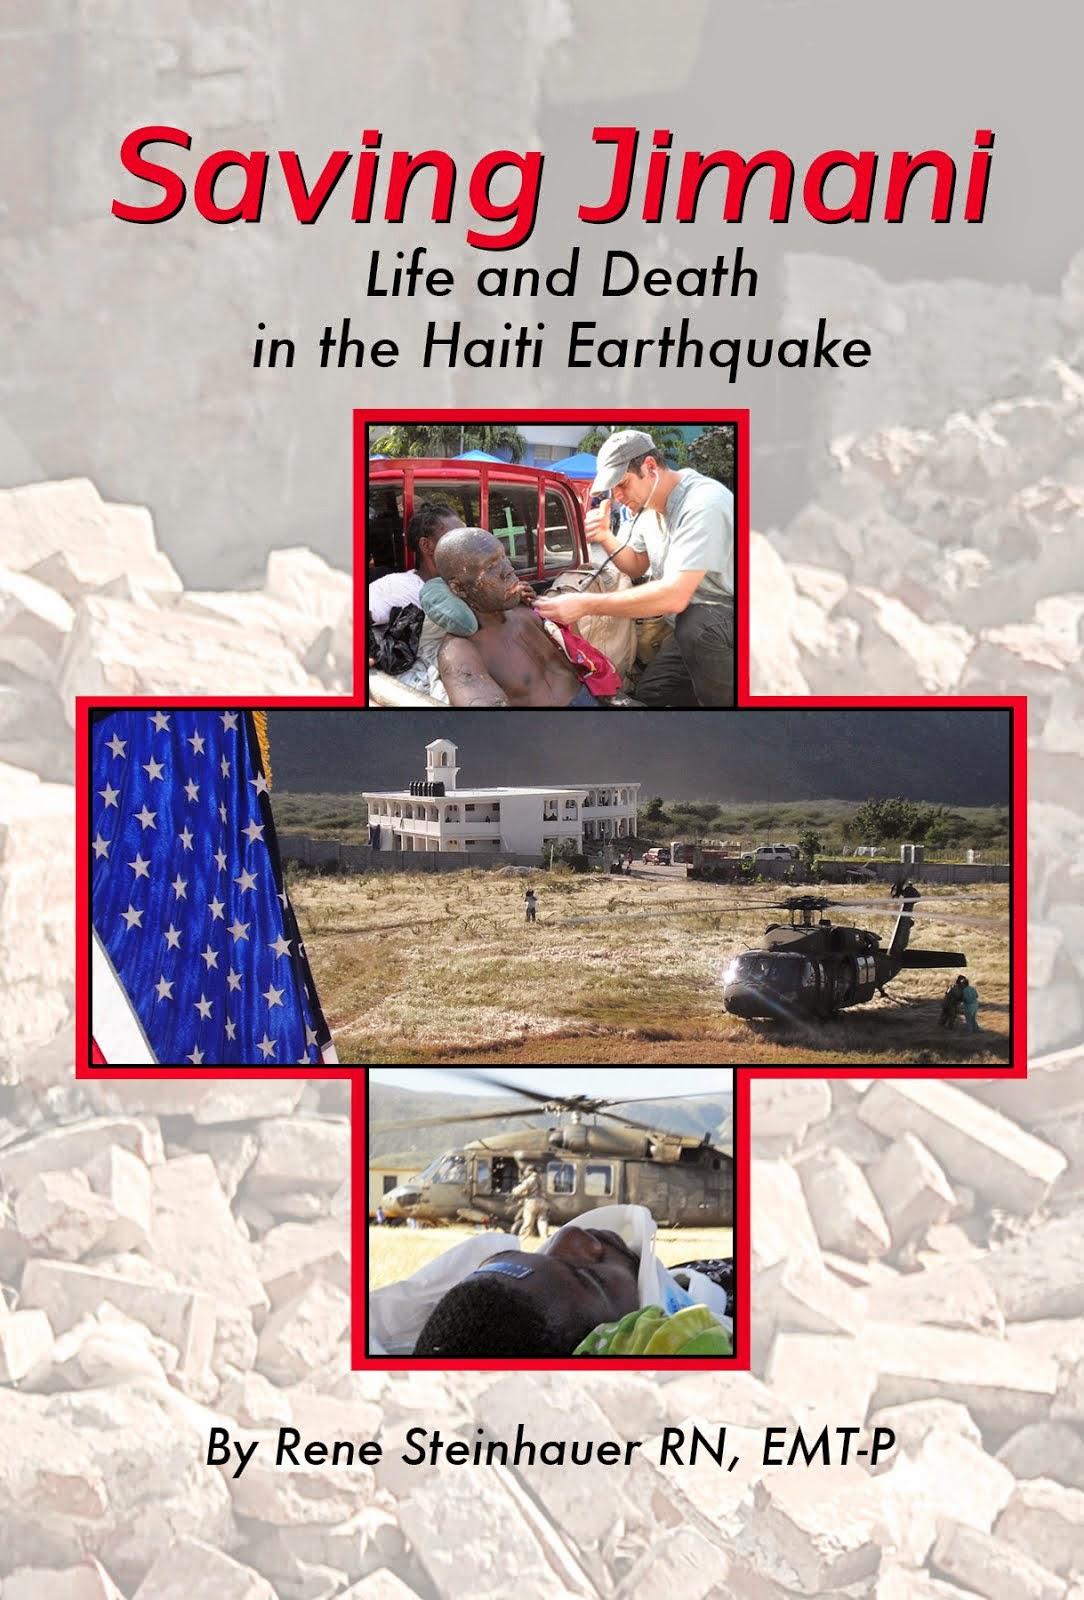 Death in Haiti